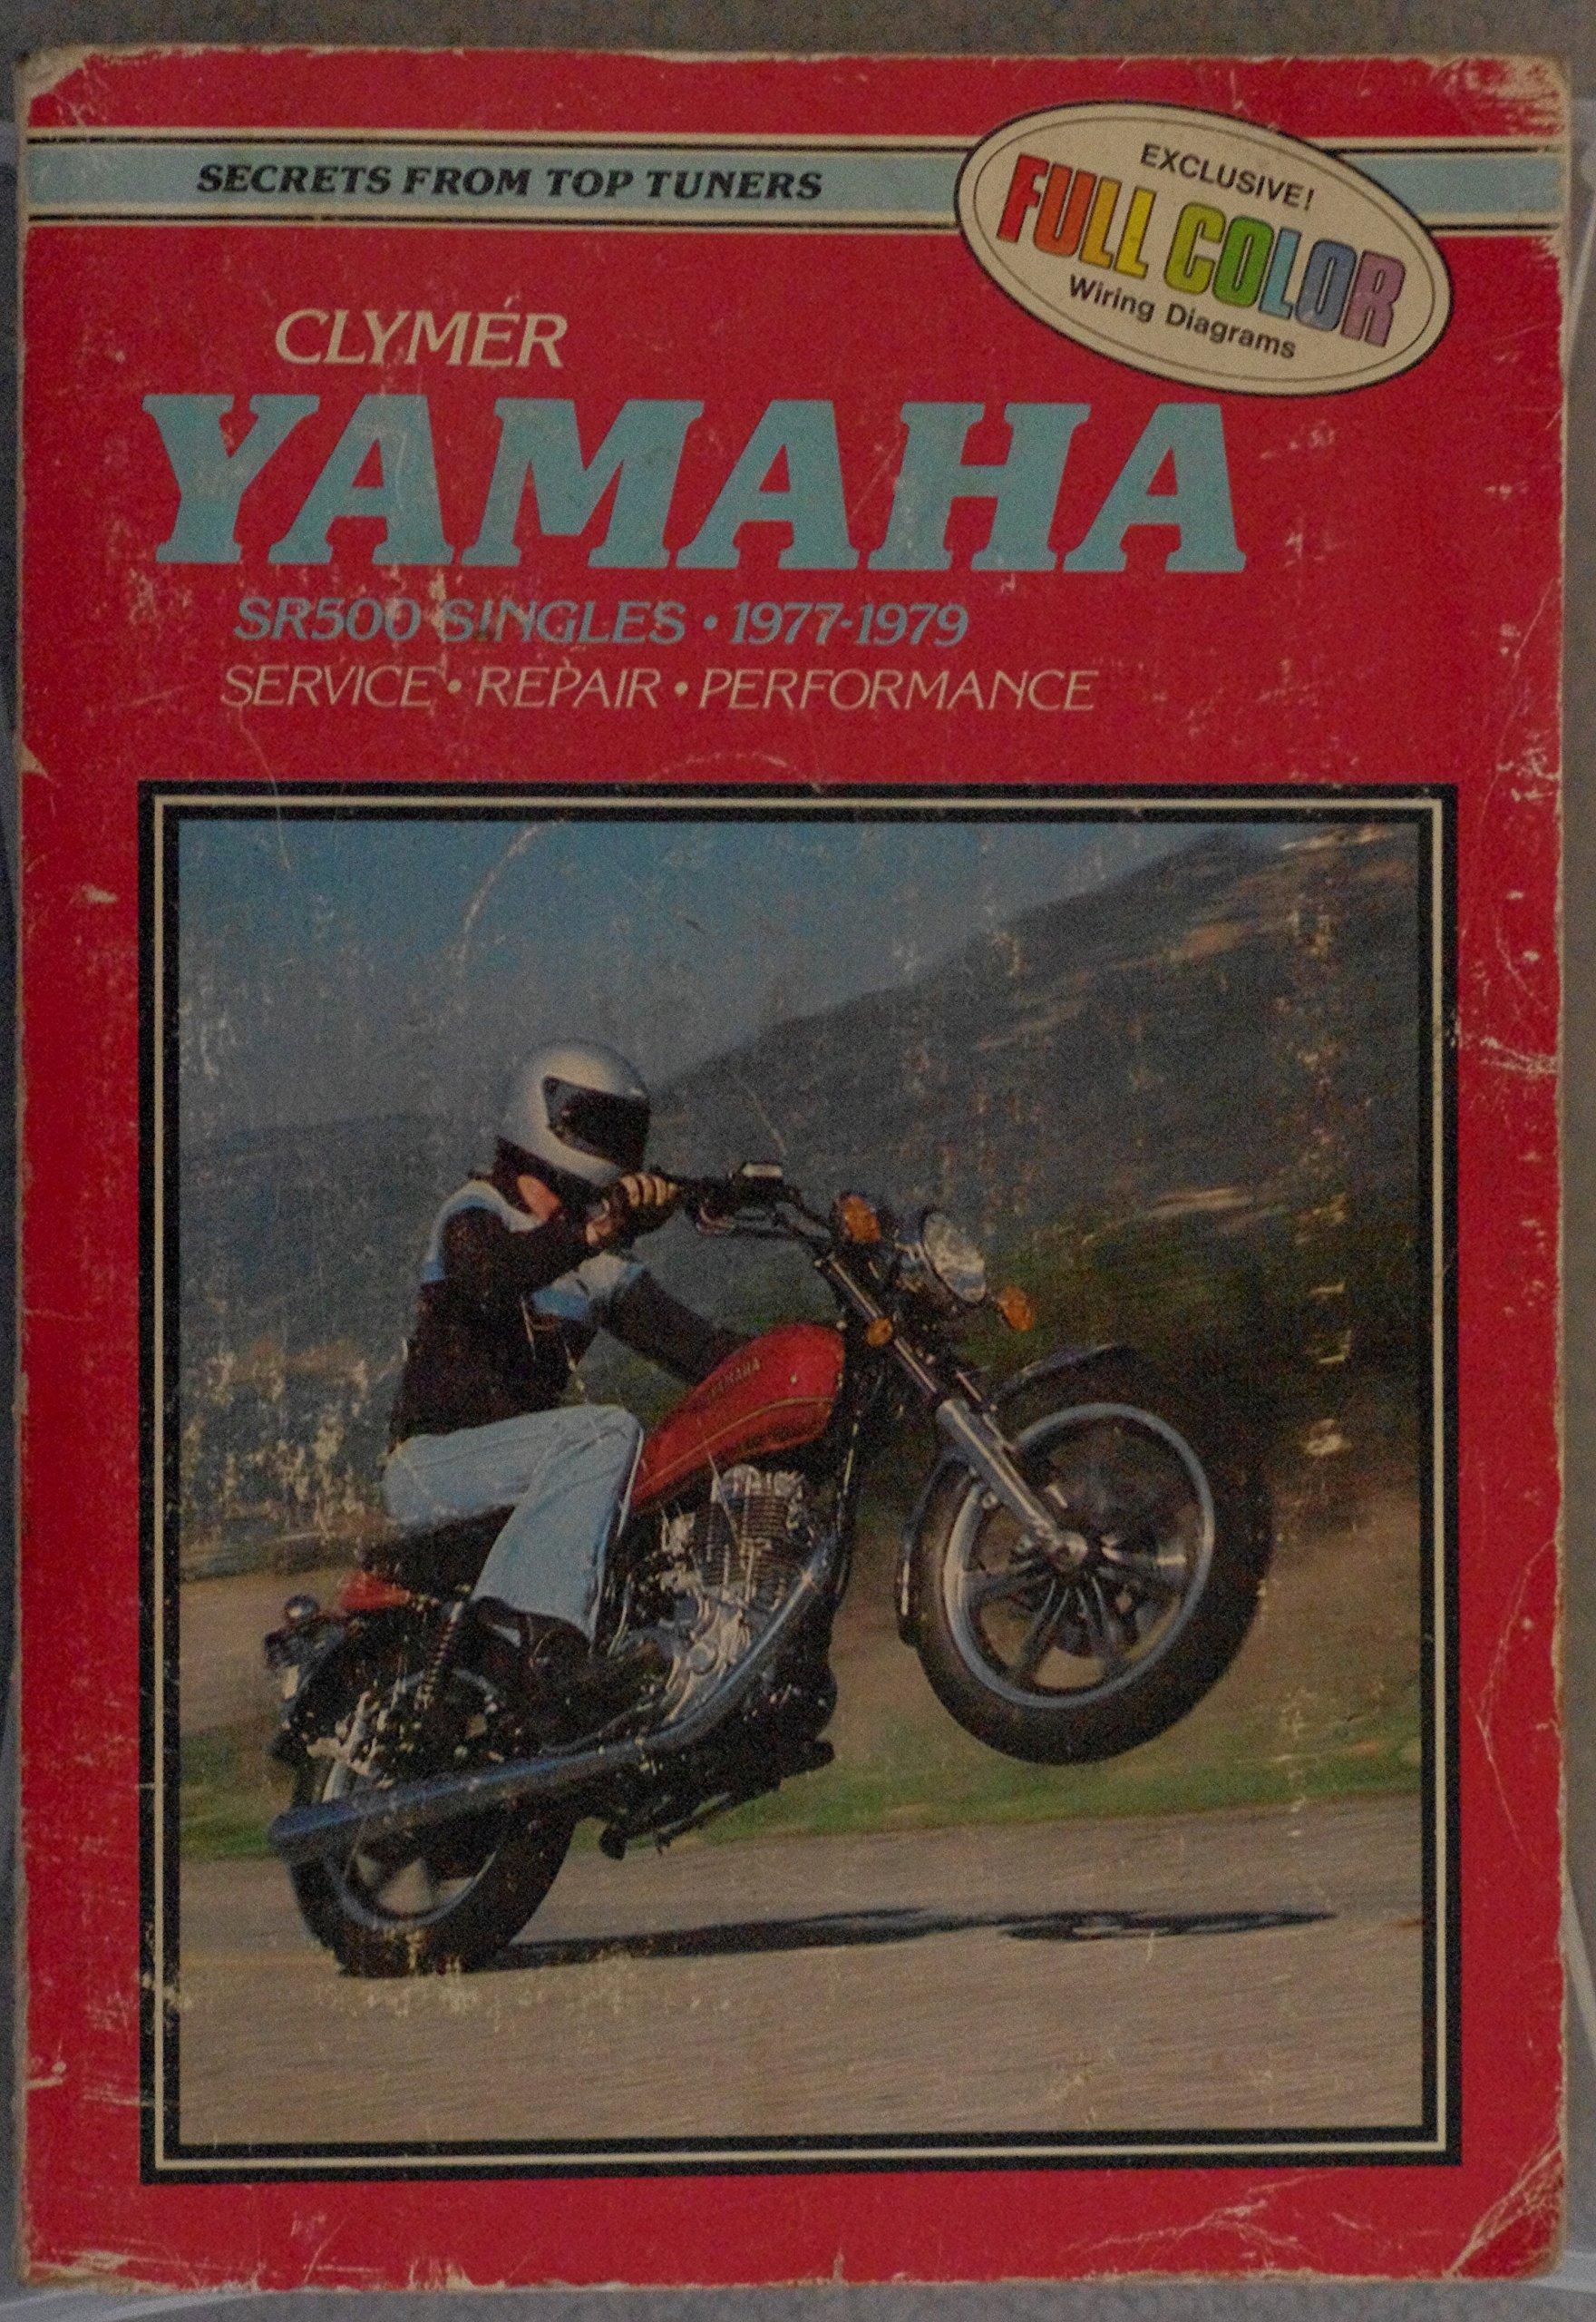 Yamaha Sr500 Singles 1977 1980 Clymer Publications 9780892872121 Wiring Diagrams Sr 500 Books